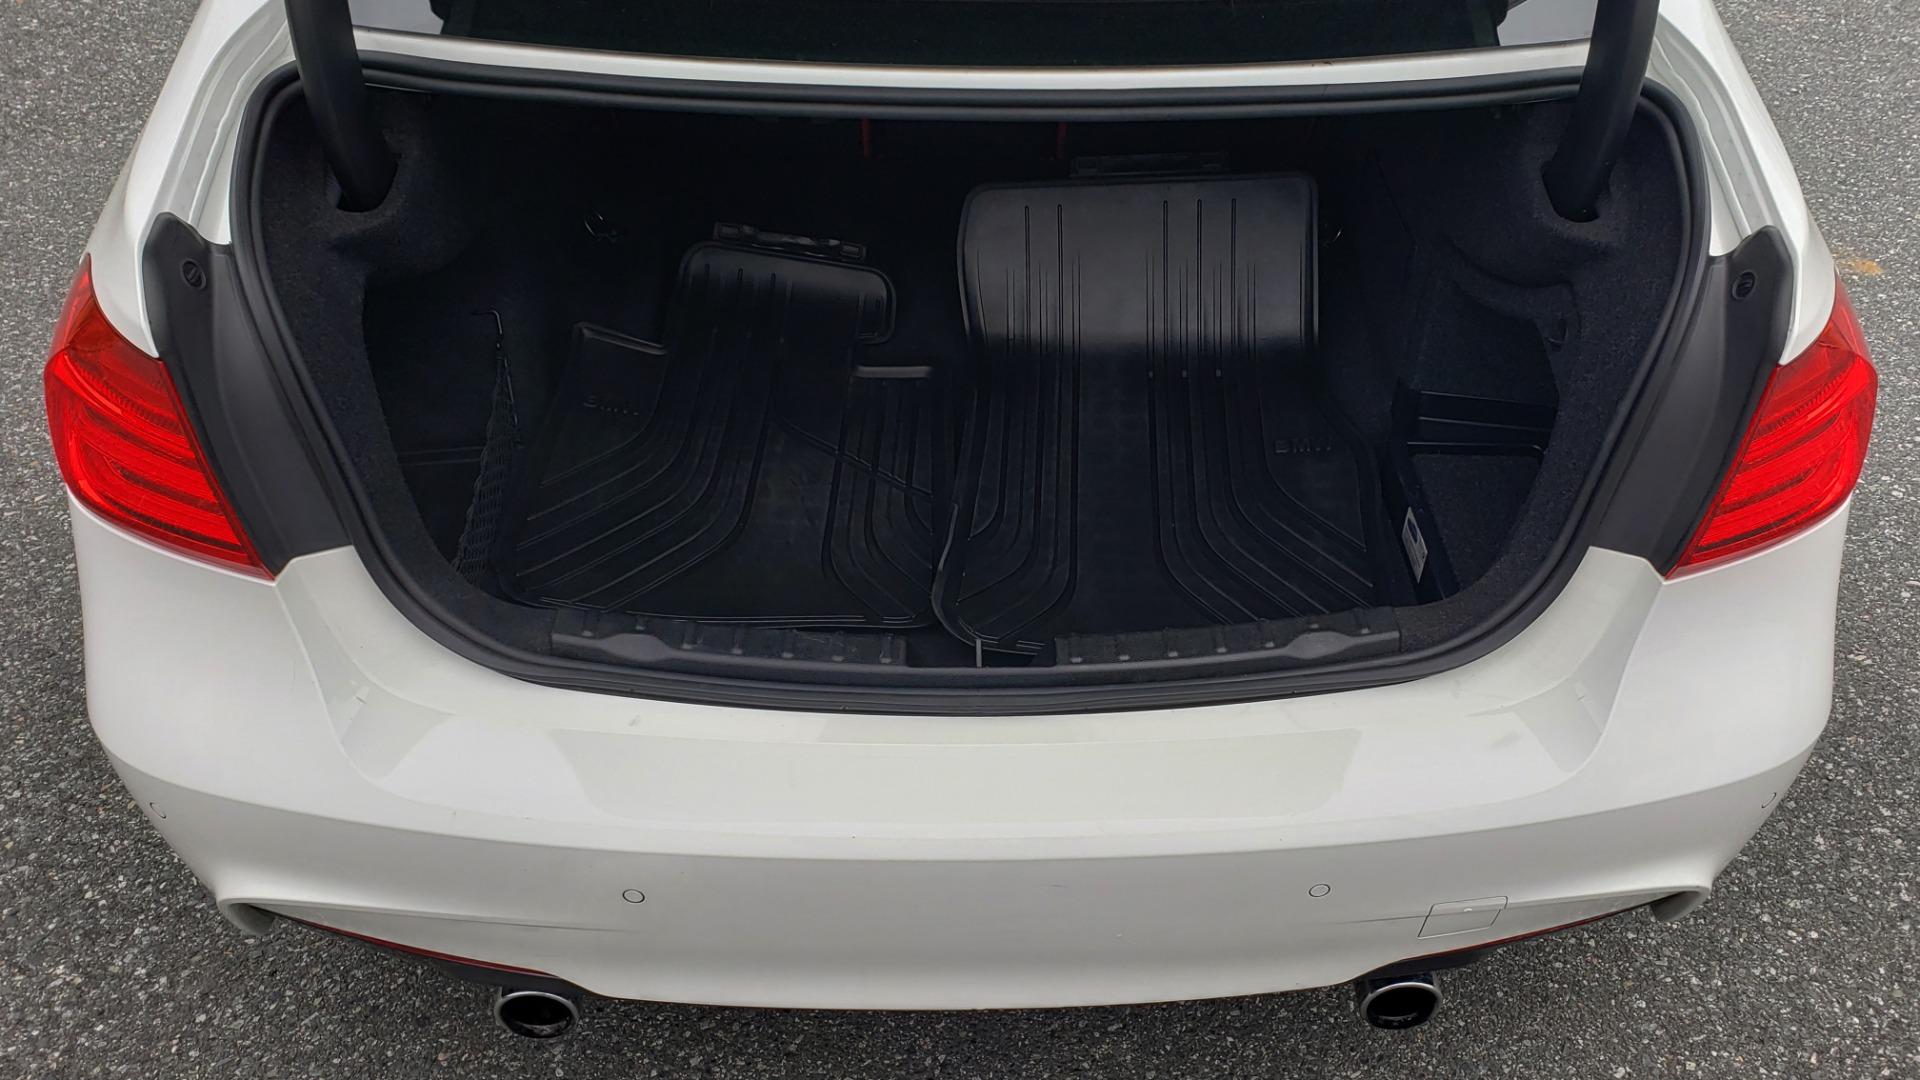 Used 2015 BMW 3 Series 335I M-SPORT / PREM PKG / HK SND / SUNROOF / REARVIEW for sale Sold at Formula Imports in Charlotte NC 28227 17